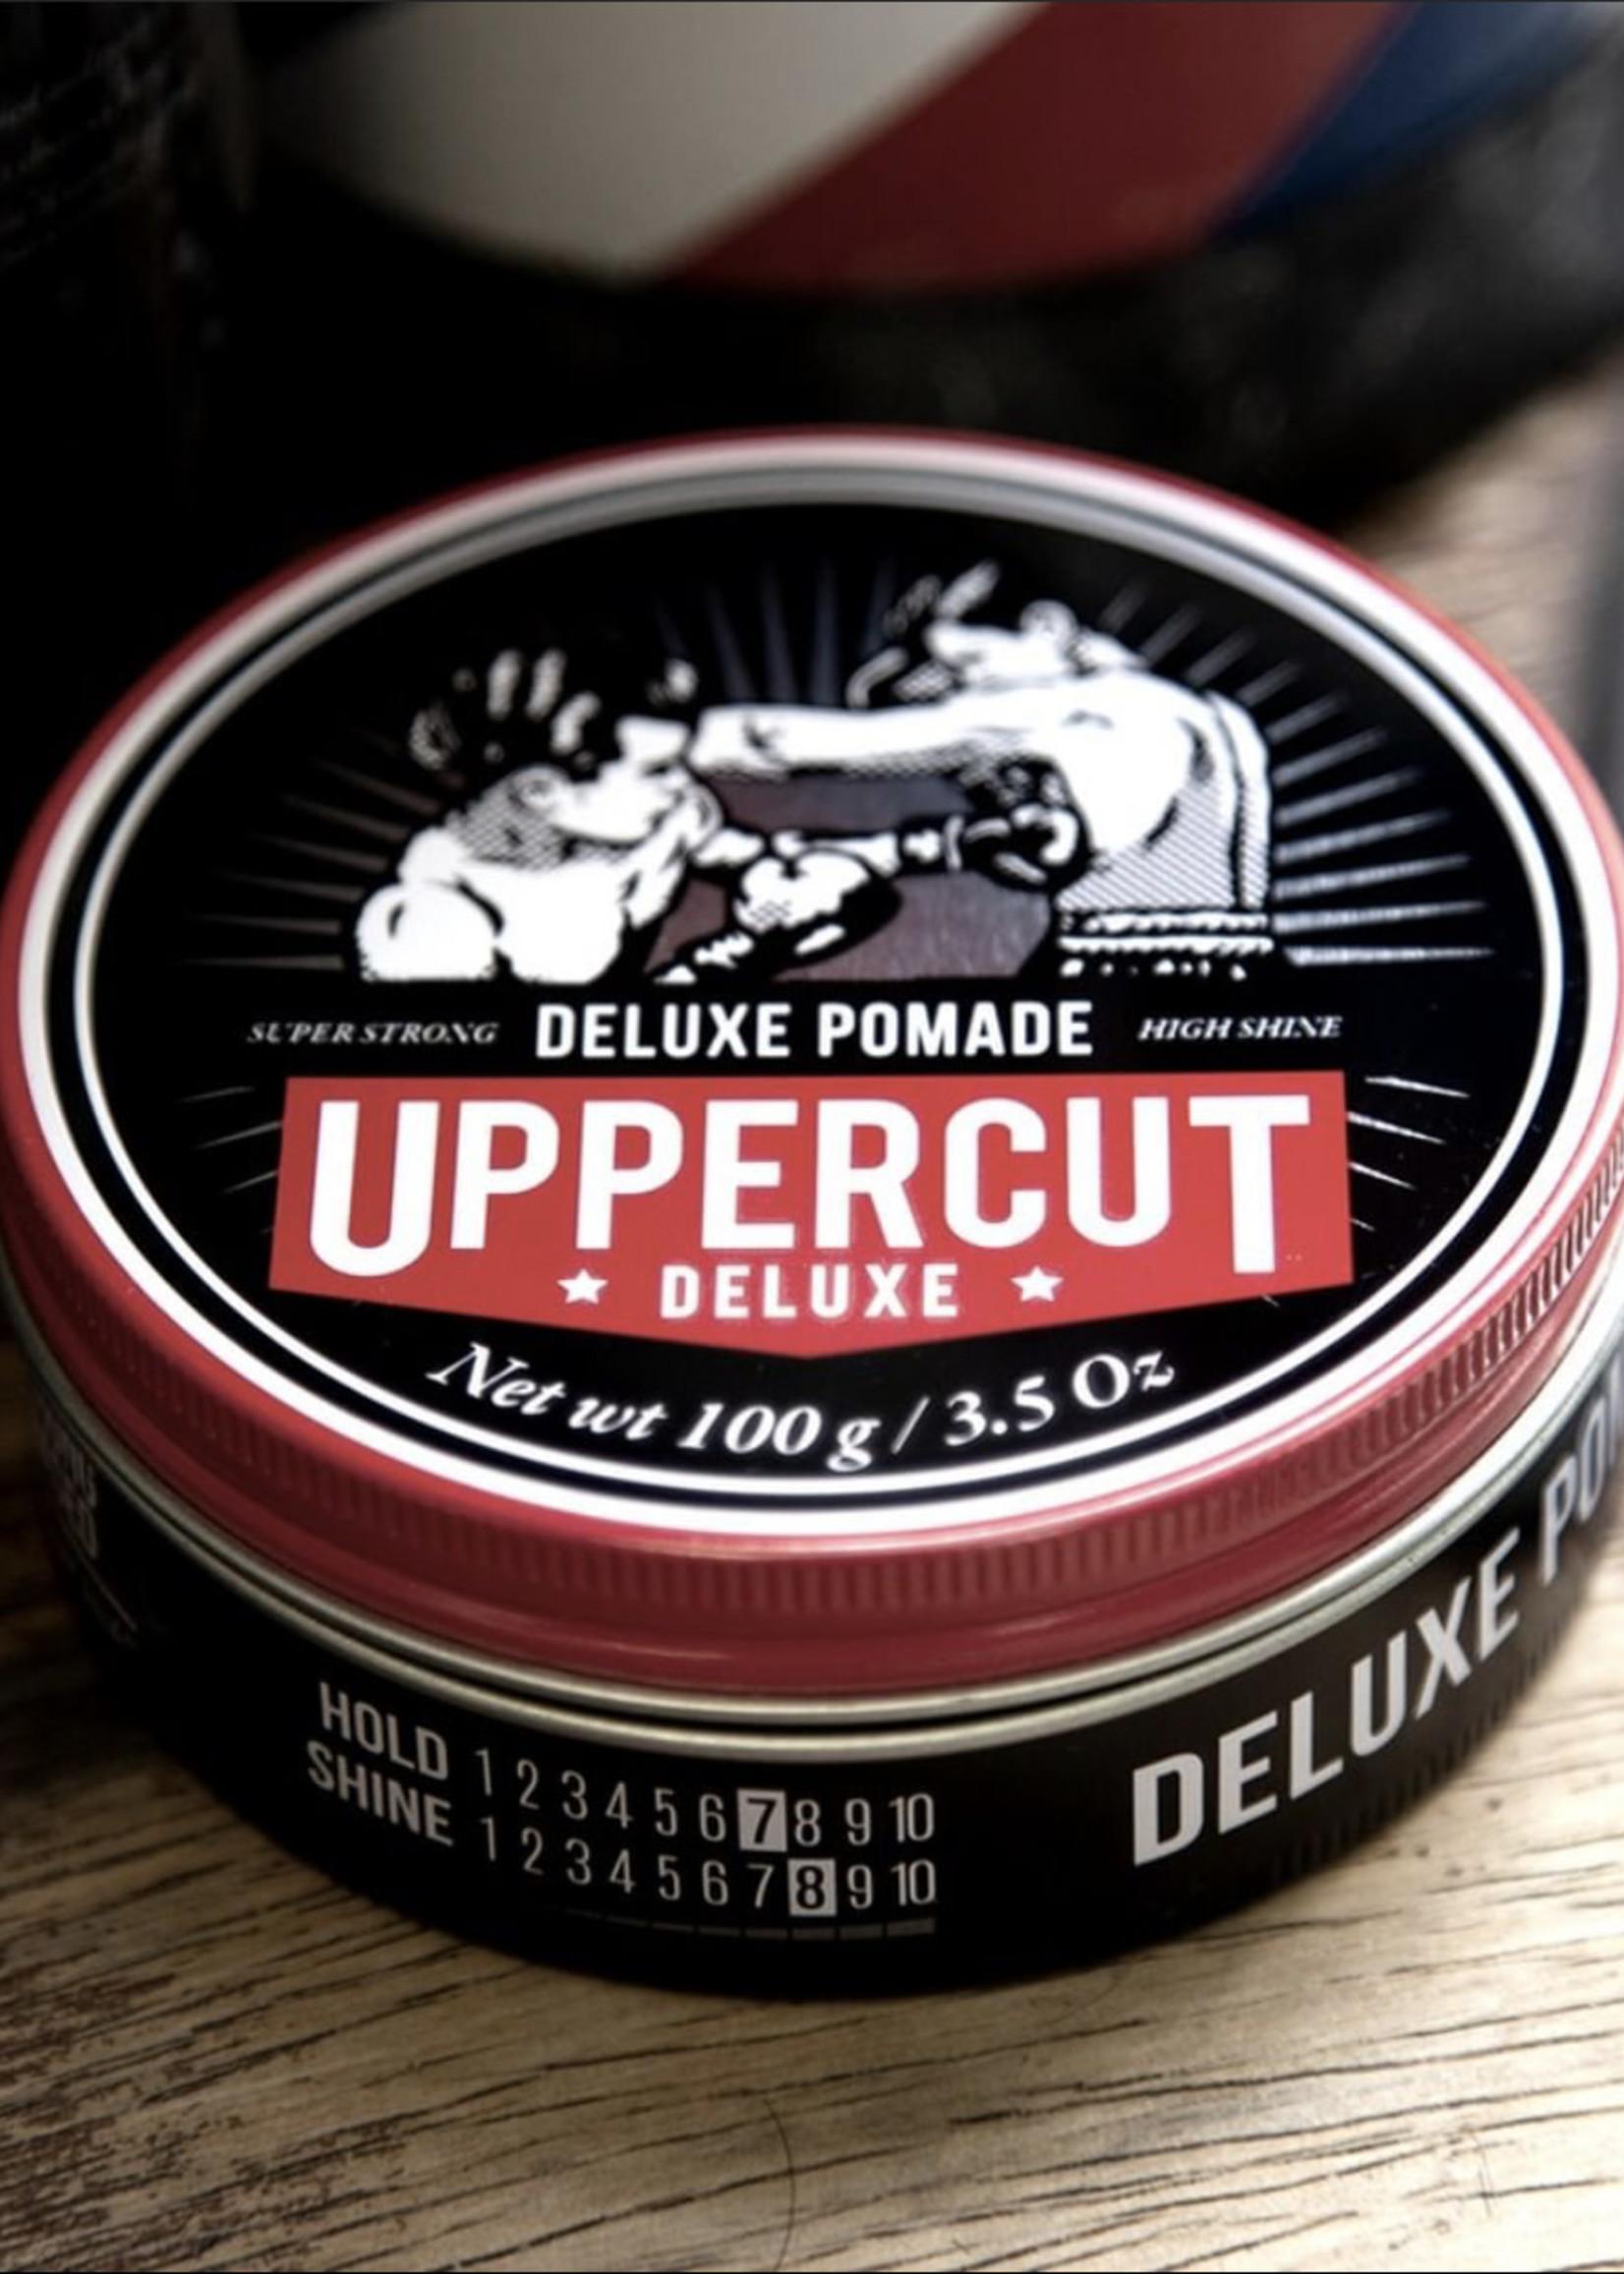 Uppercut Deluxe Uppercut Deluxe Pomade- Deluxe